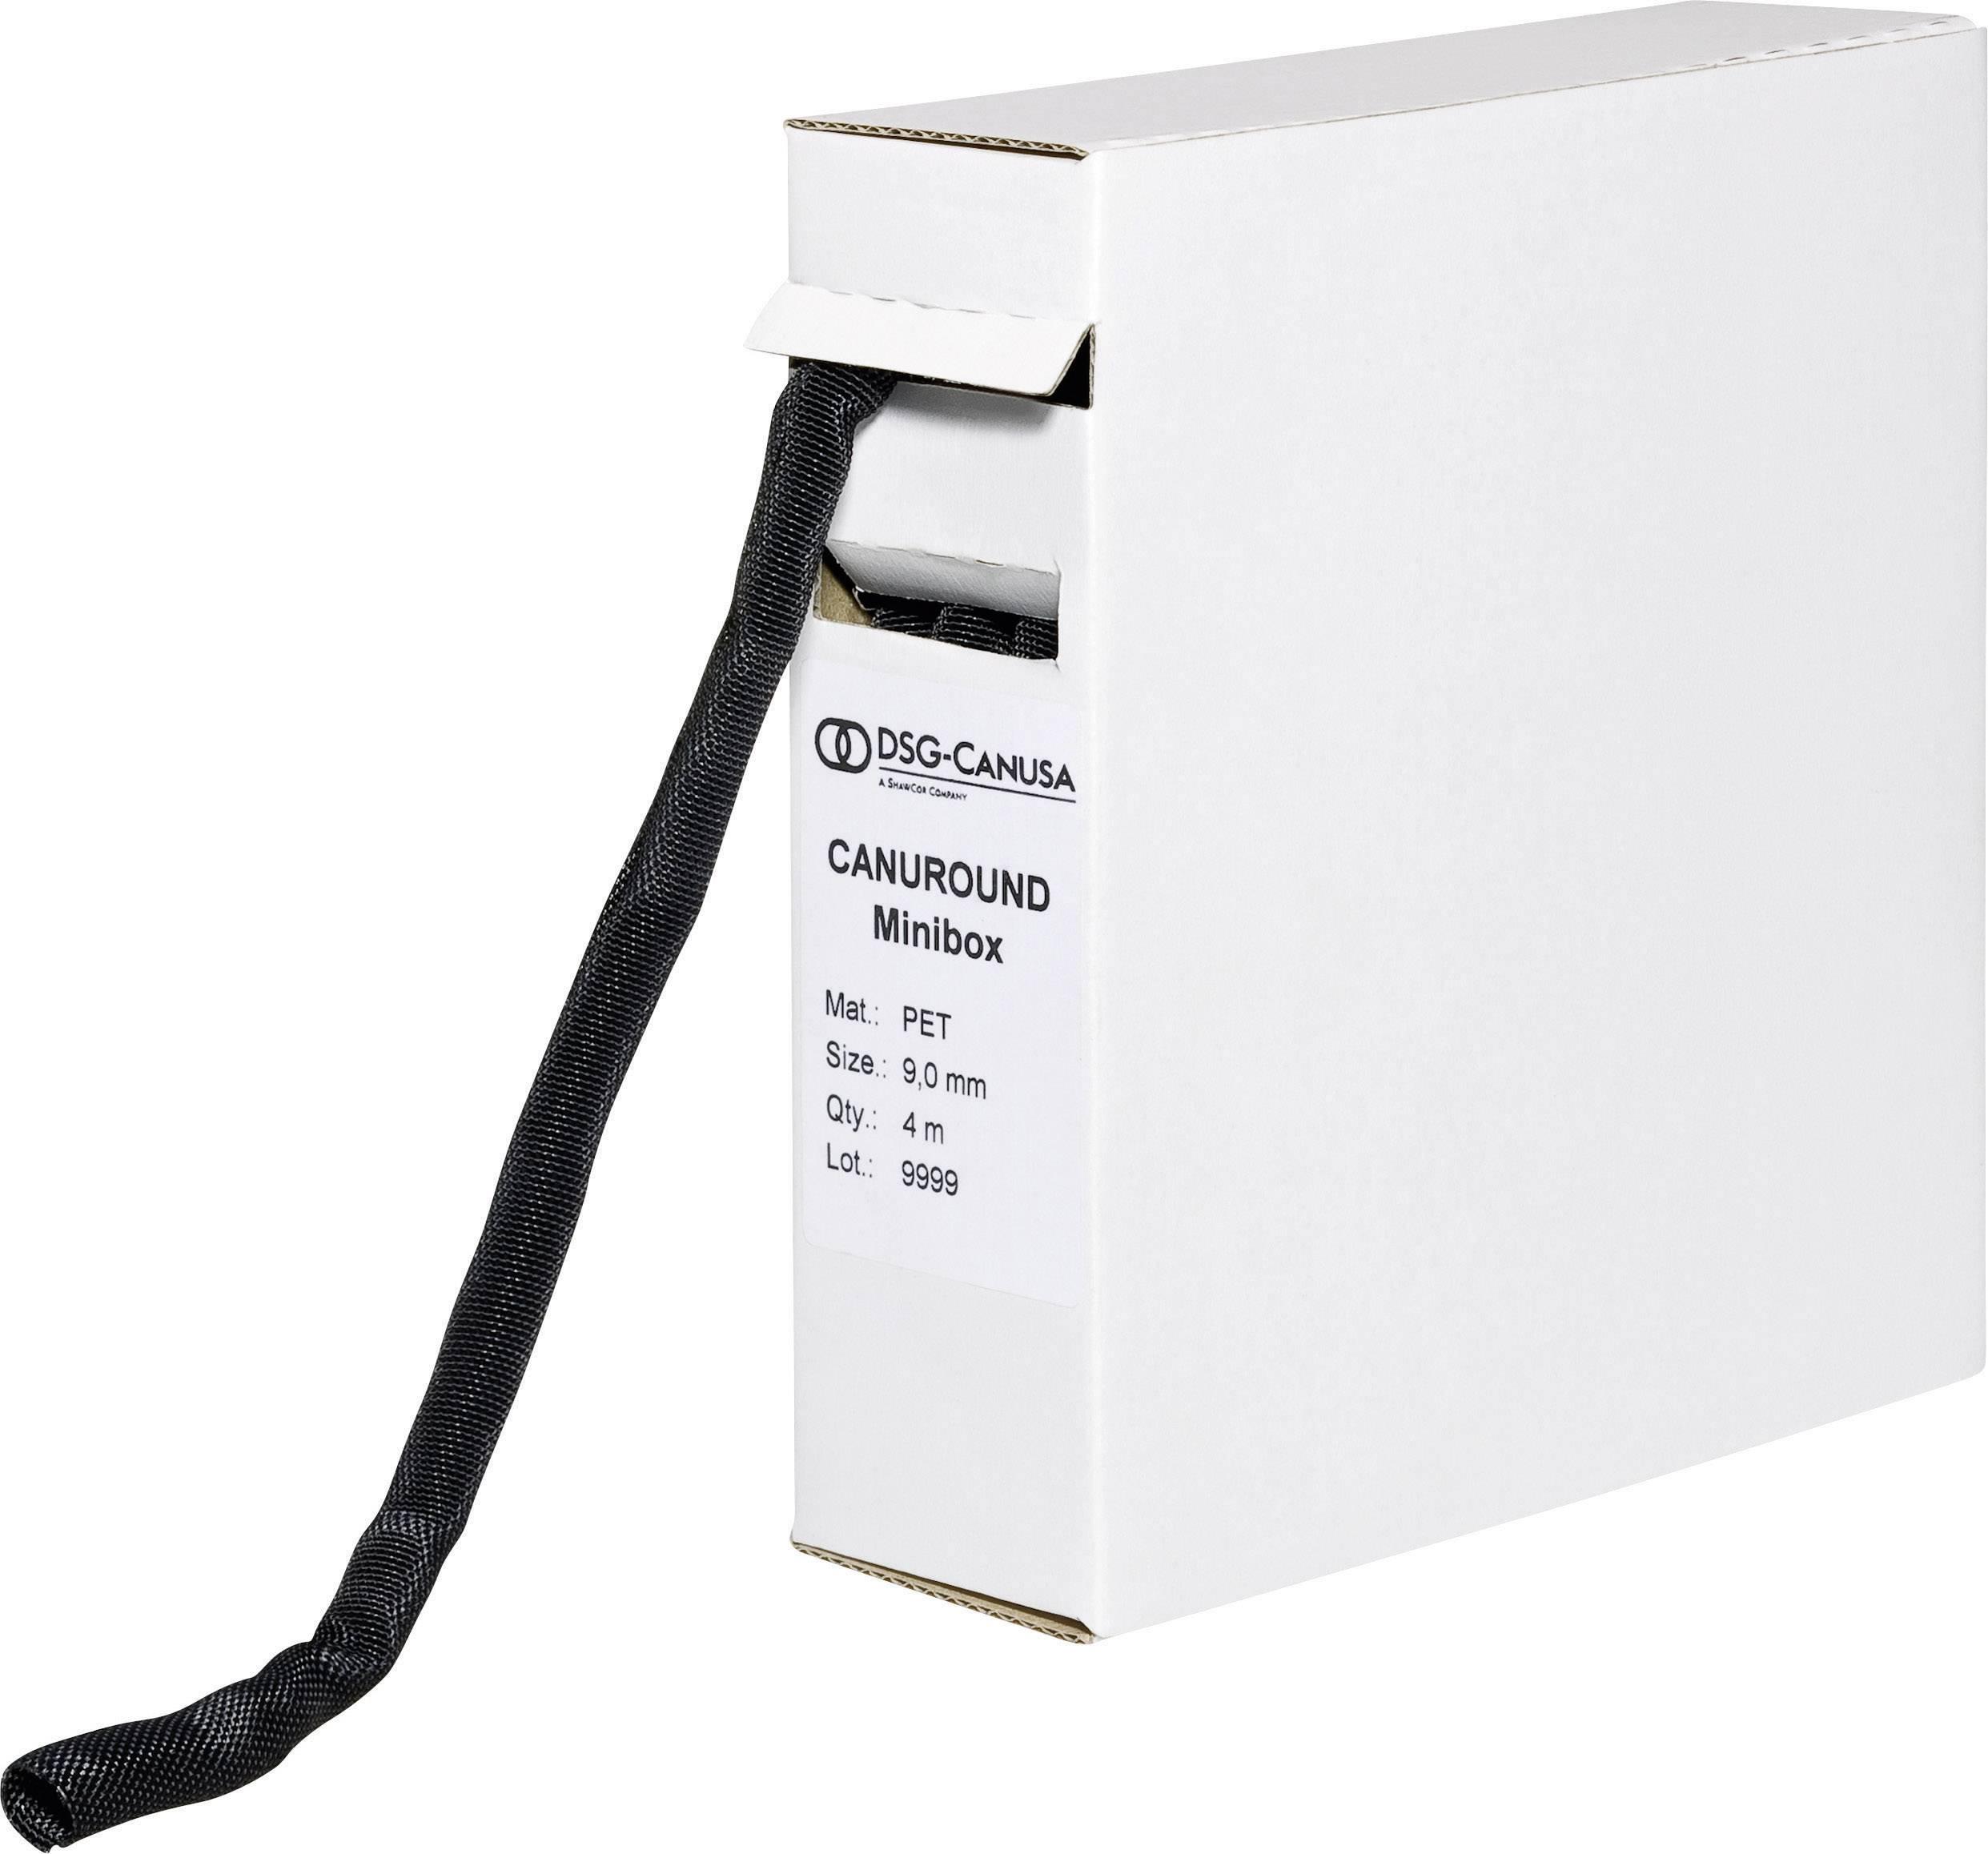 Ochranný oplet DSG Canusa 5 do 5 mm, -55 do +150 °C, 10 m, čierna